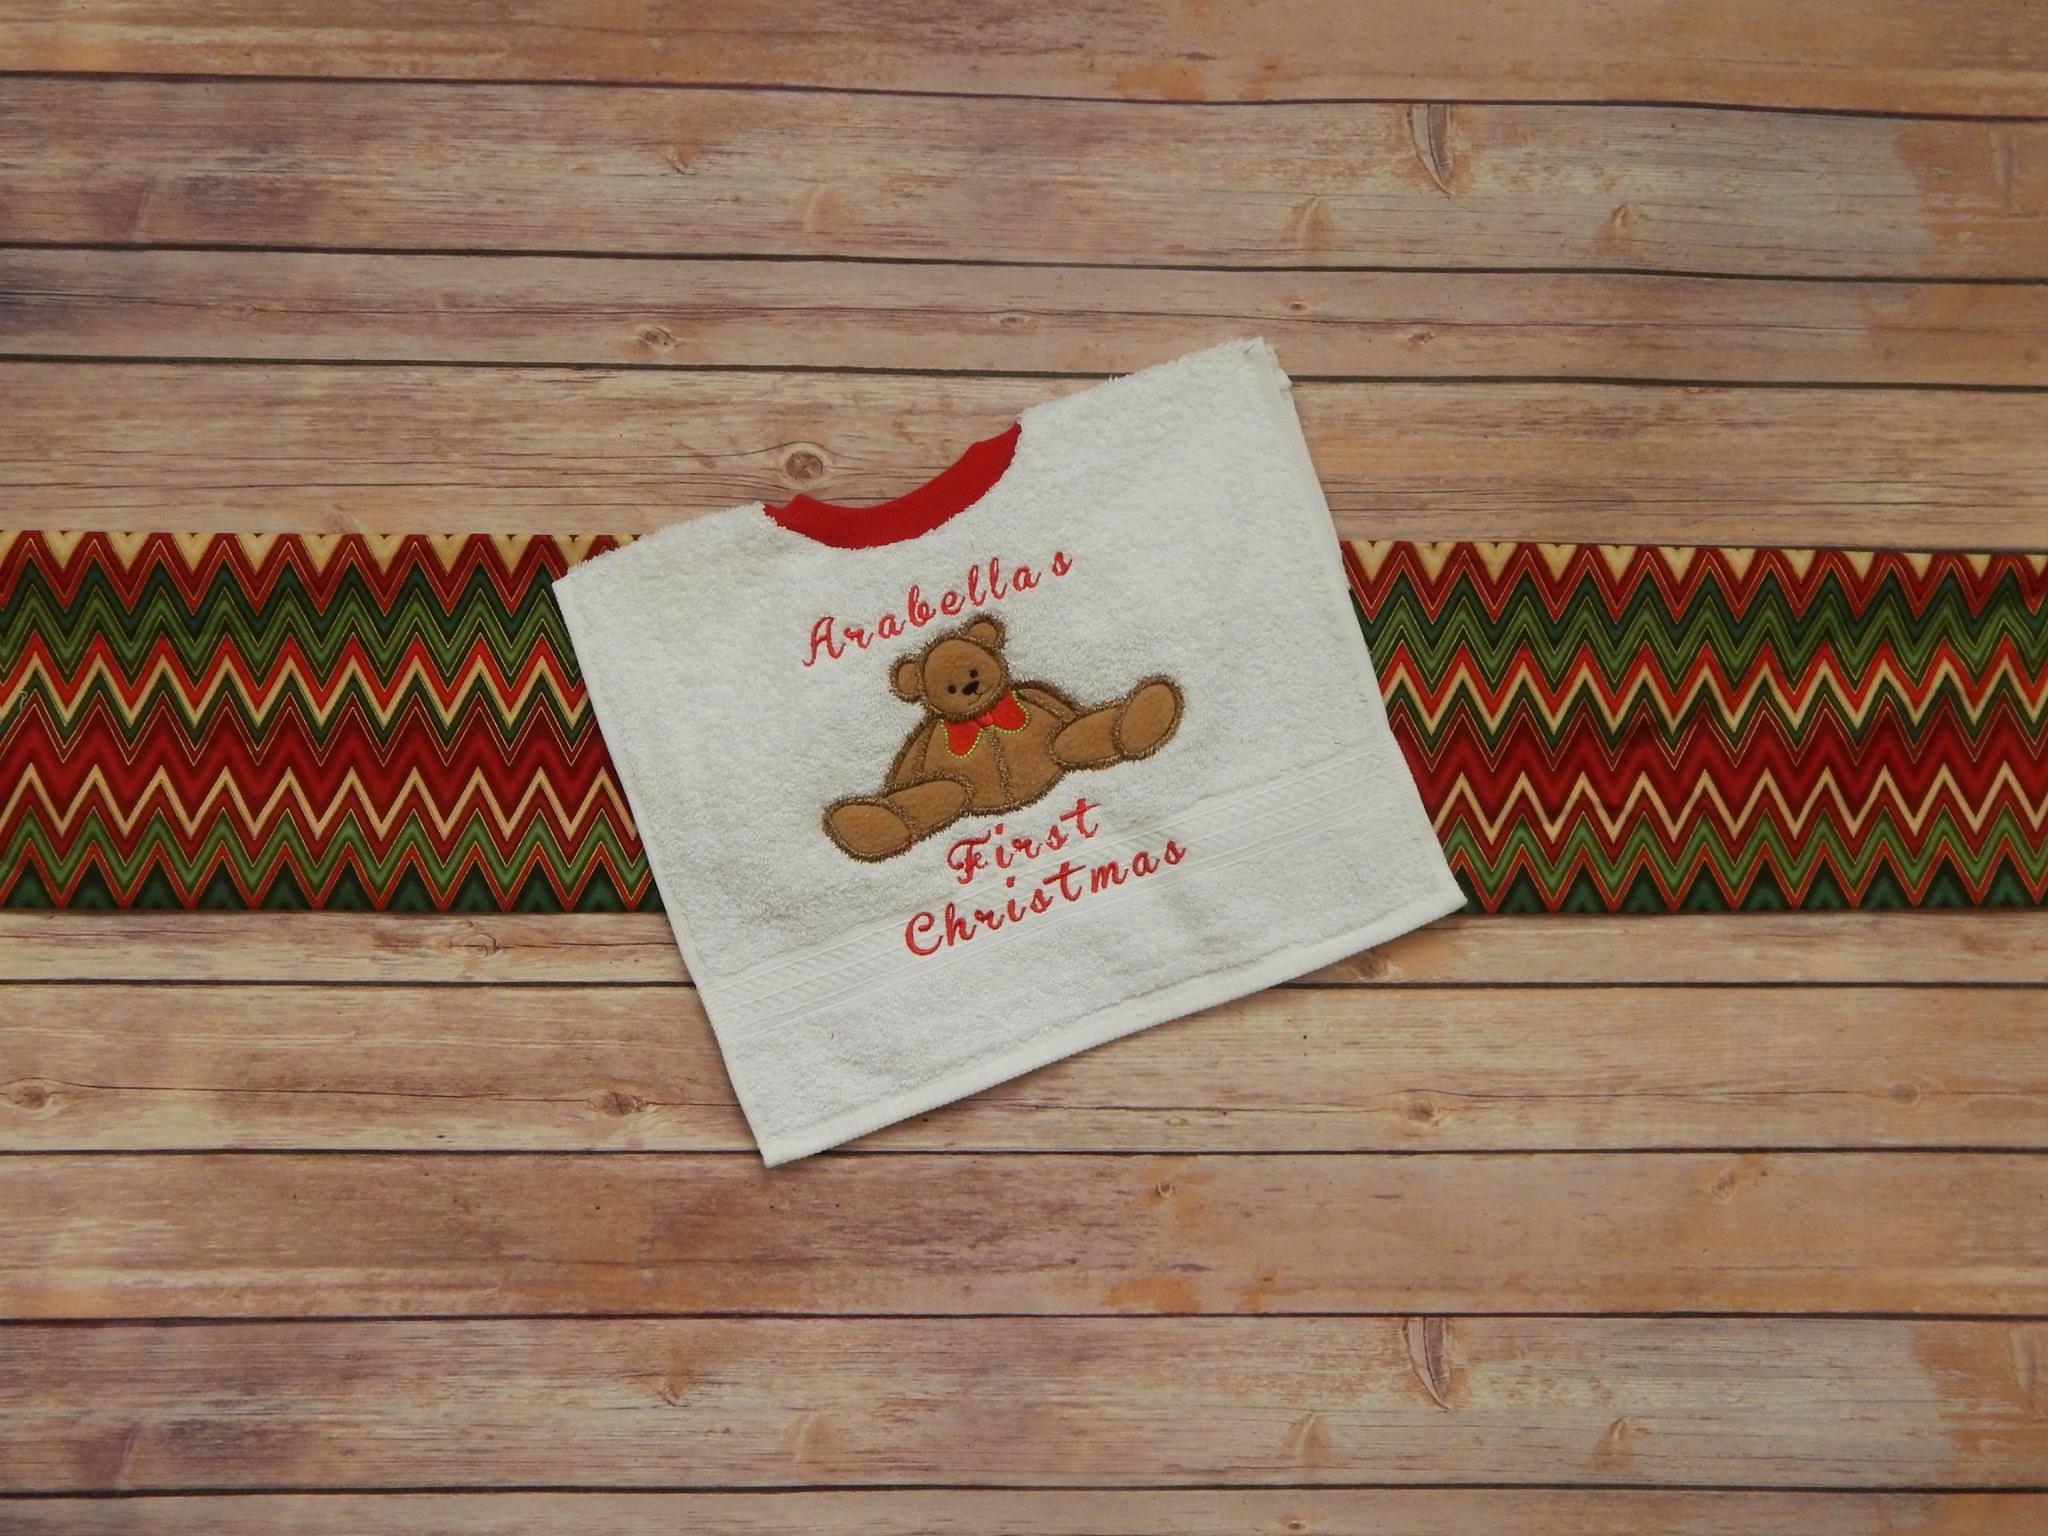 dbjj215-fuzzy-christmas-teddy-bear-priscila-script-embroidery